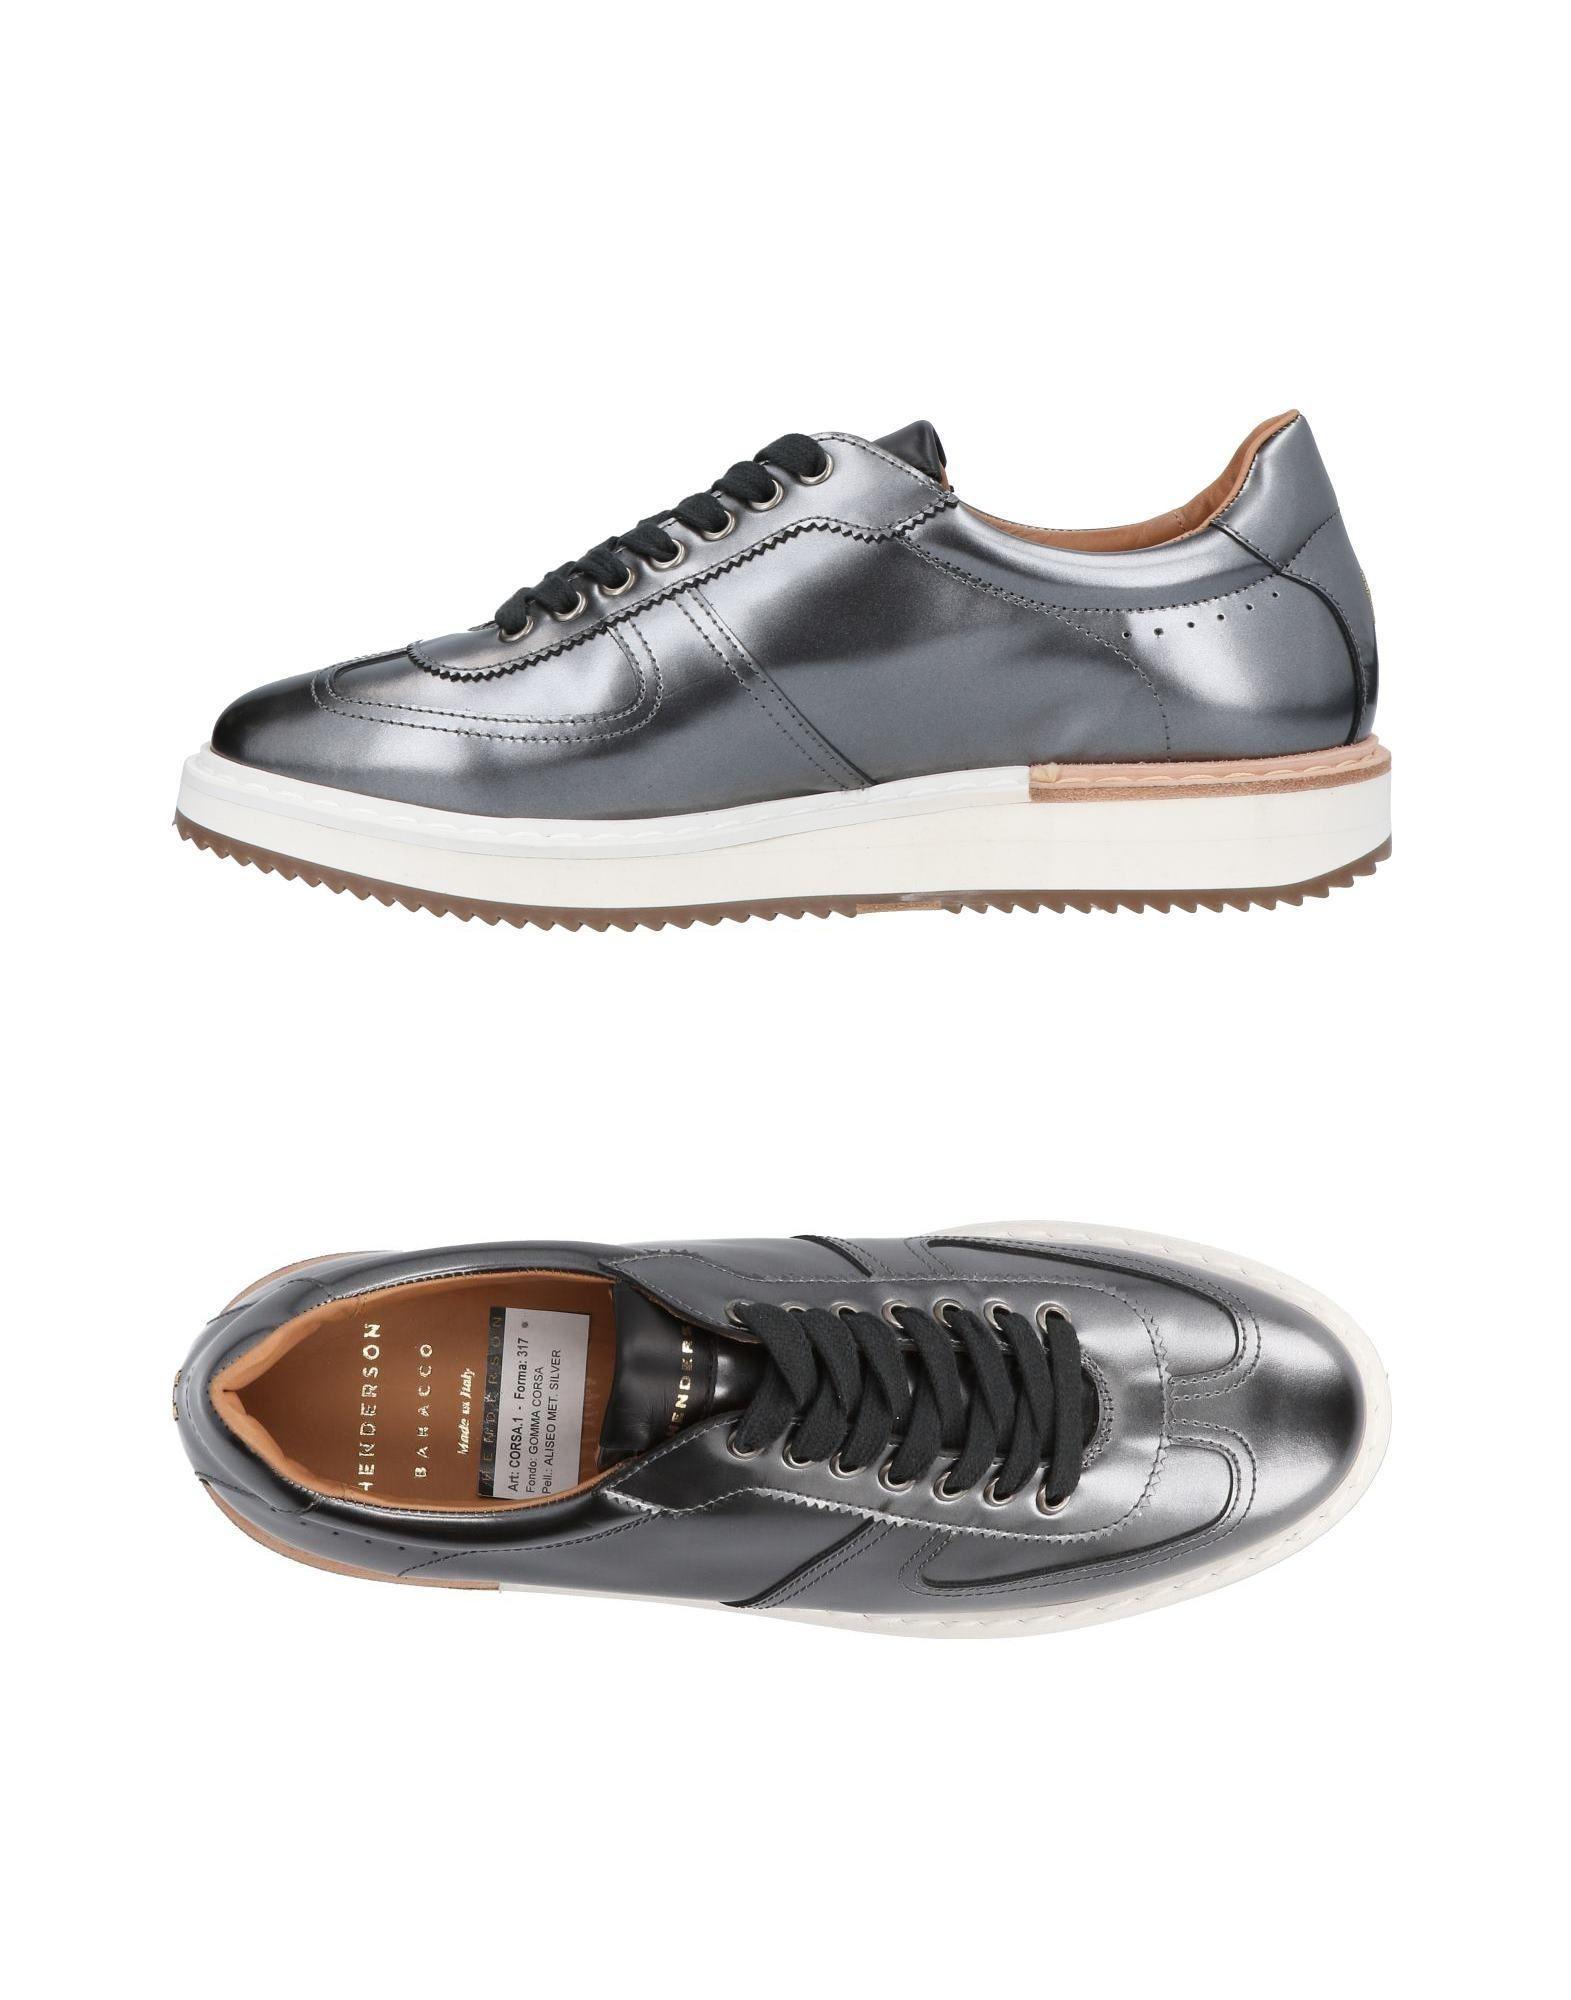 Henderson Bas-tops Et Chaussures De Sport Wm8qNNr